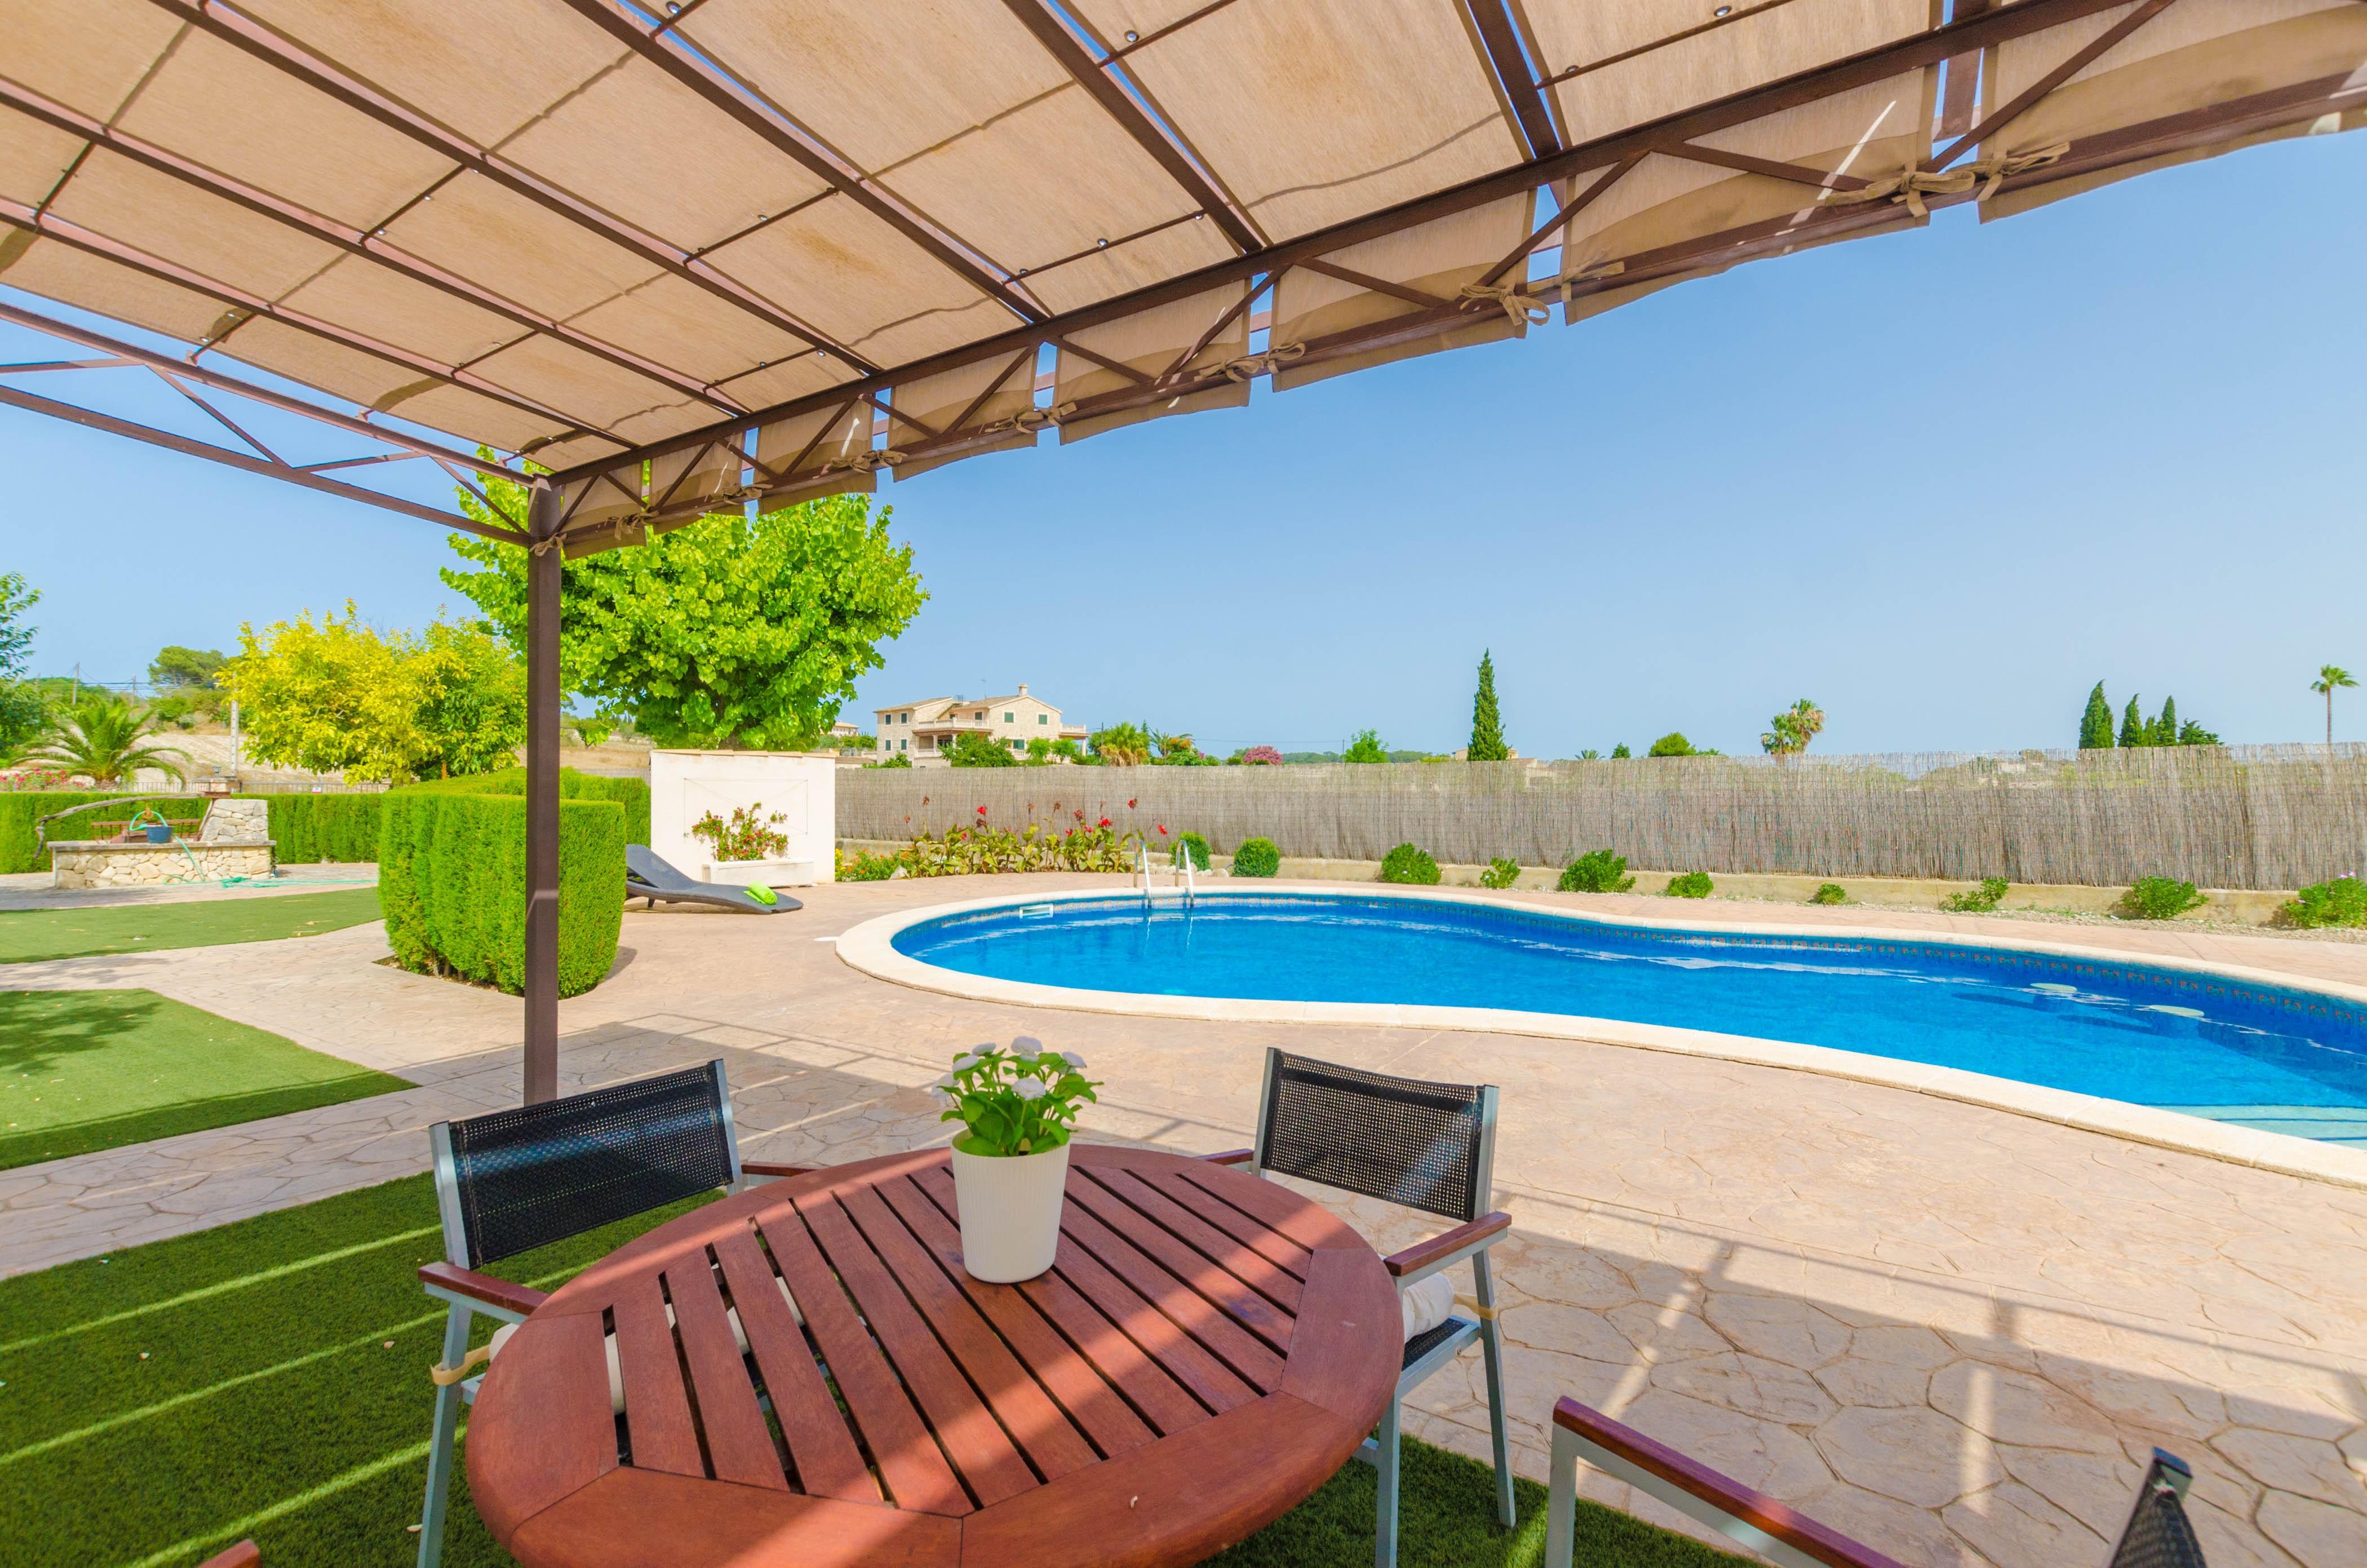 Maison de vacances SA SINIA (2374876), Lloret de Vistalegre, Majorque, Iles Baléares, Espagne, image 47